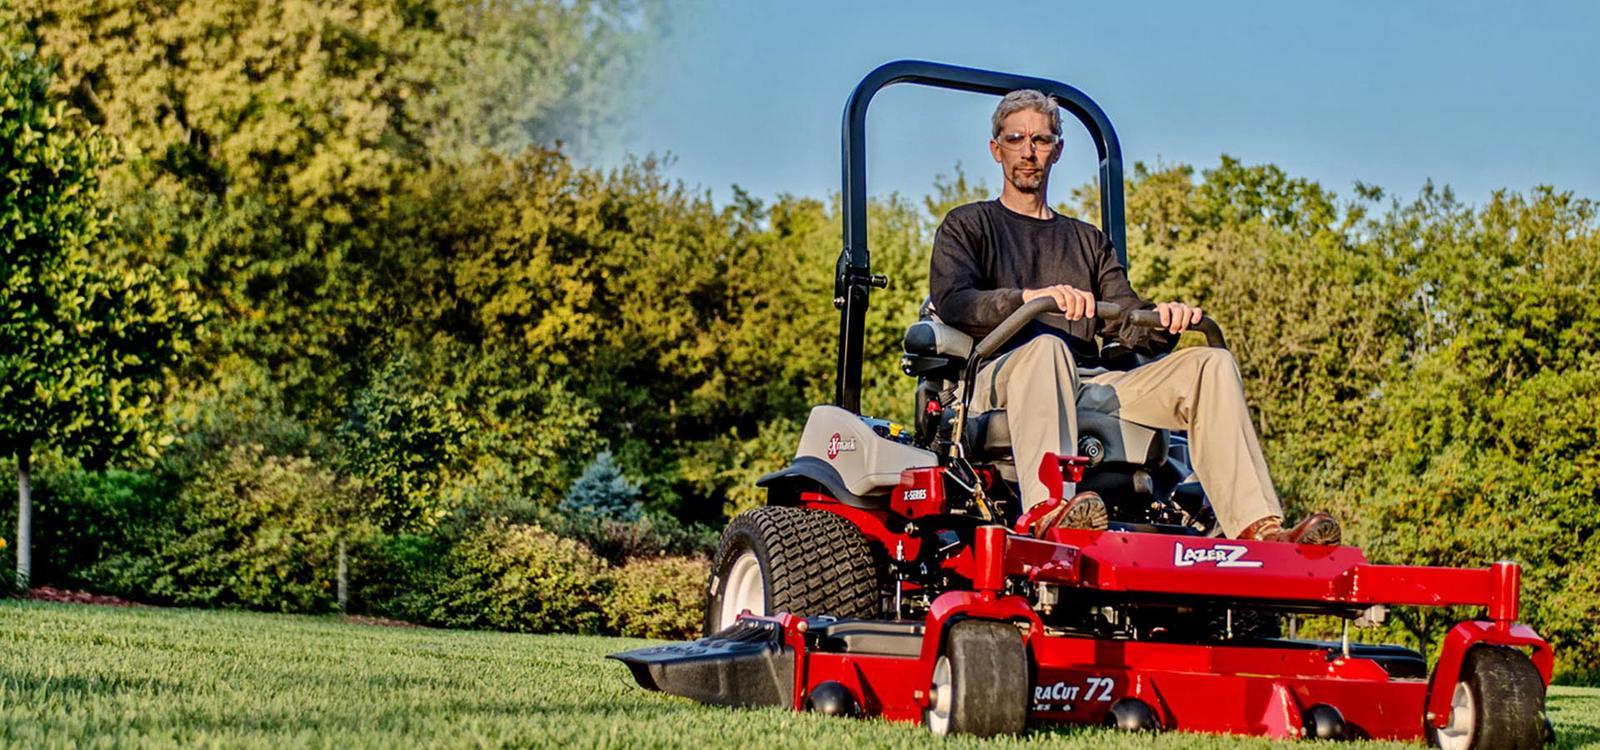 Exmark lawn mowers